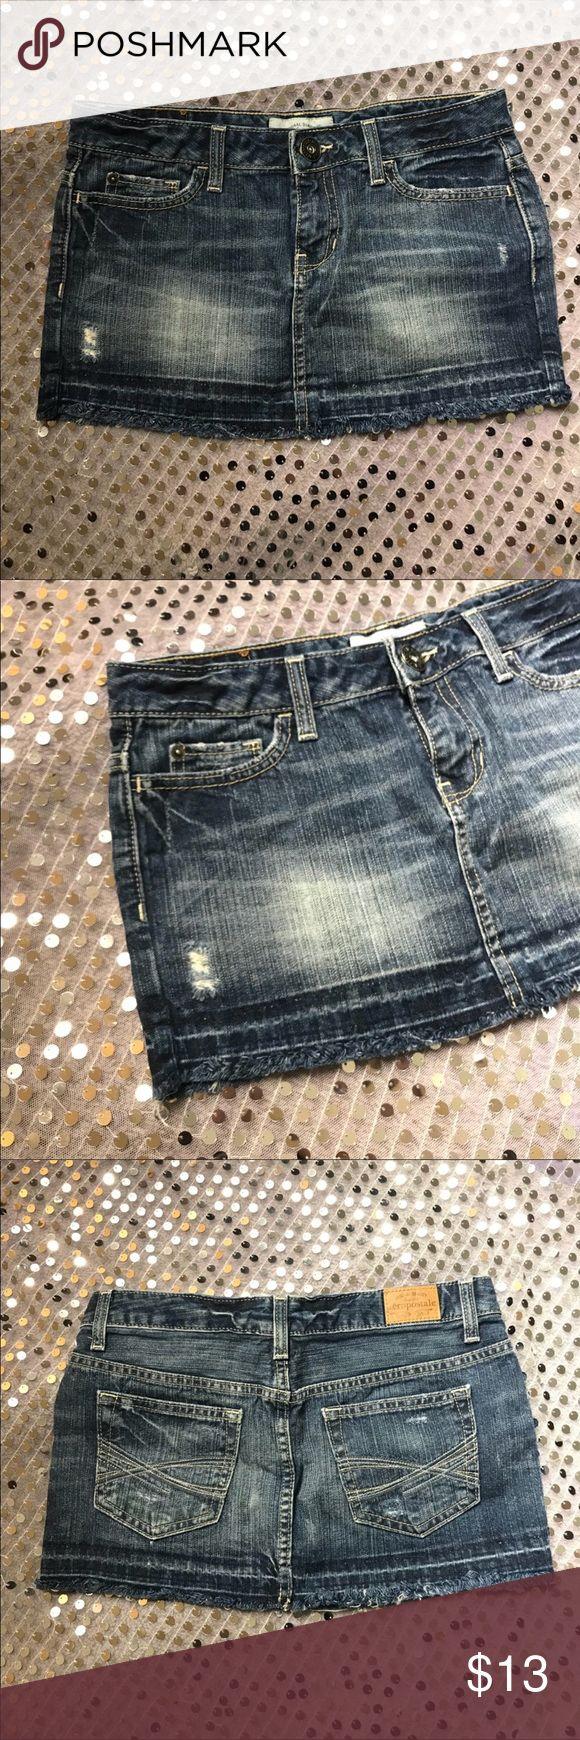 Aeropostale Denim Jean Skirt Size 3/4 Aeropostale Denim Jean Skirt  Size 3/4 Waist: 14/28 Fabric: 100% Cotton Color: Denim skirt NO Damage, Snags or Stains Aeropostale Skirts